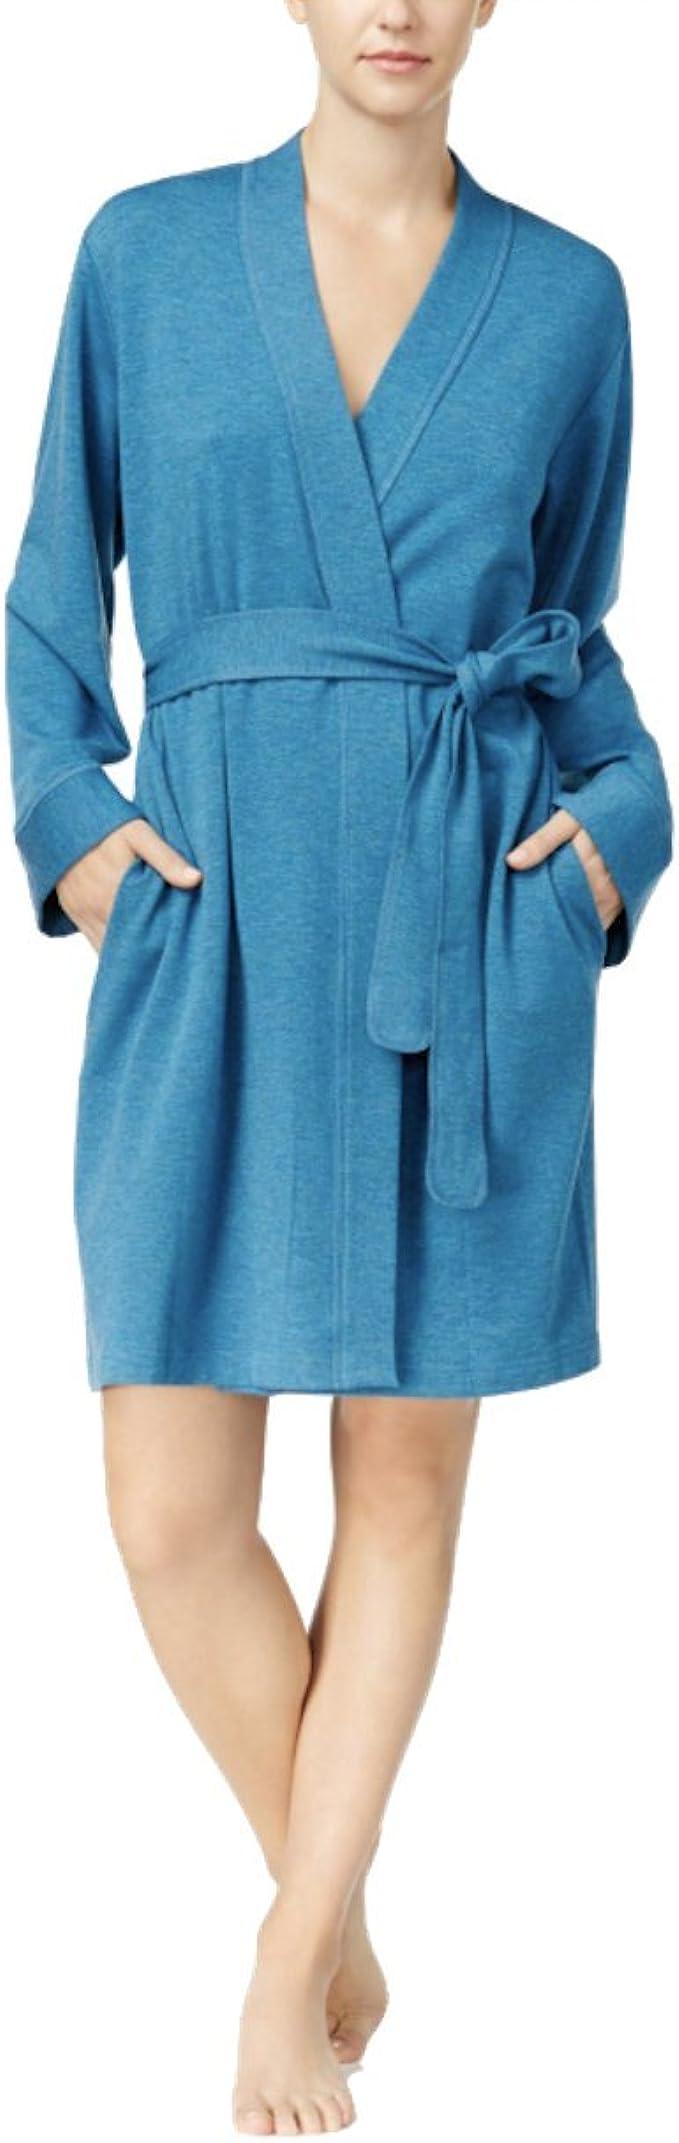 Mfasica Men Robe Fleece Turkish Nightgown Home Terry Cloth Pajamas